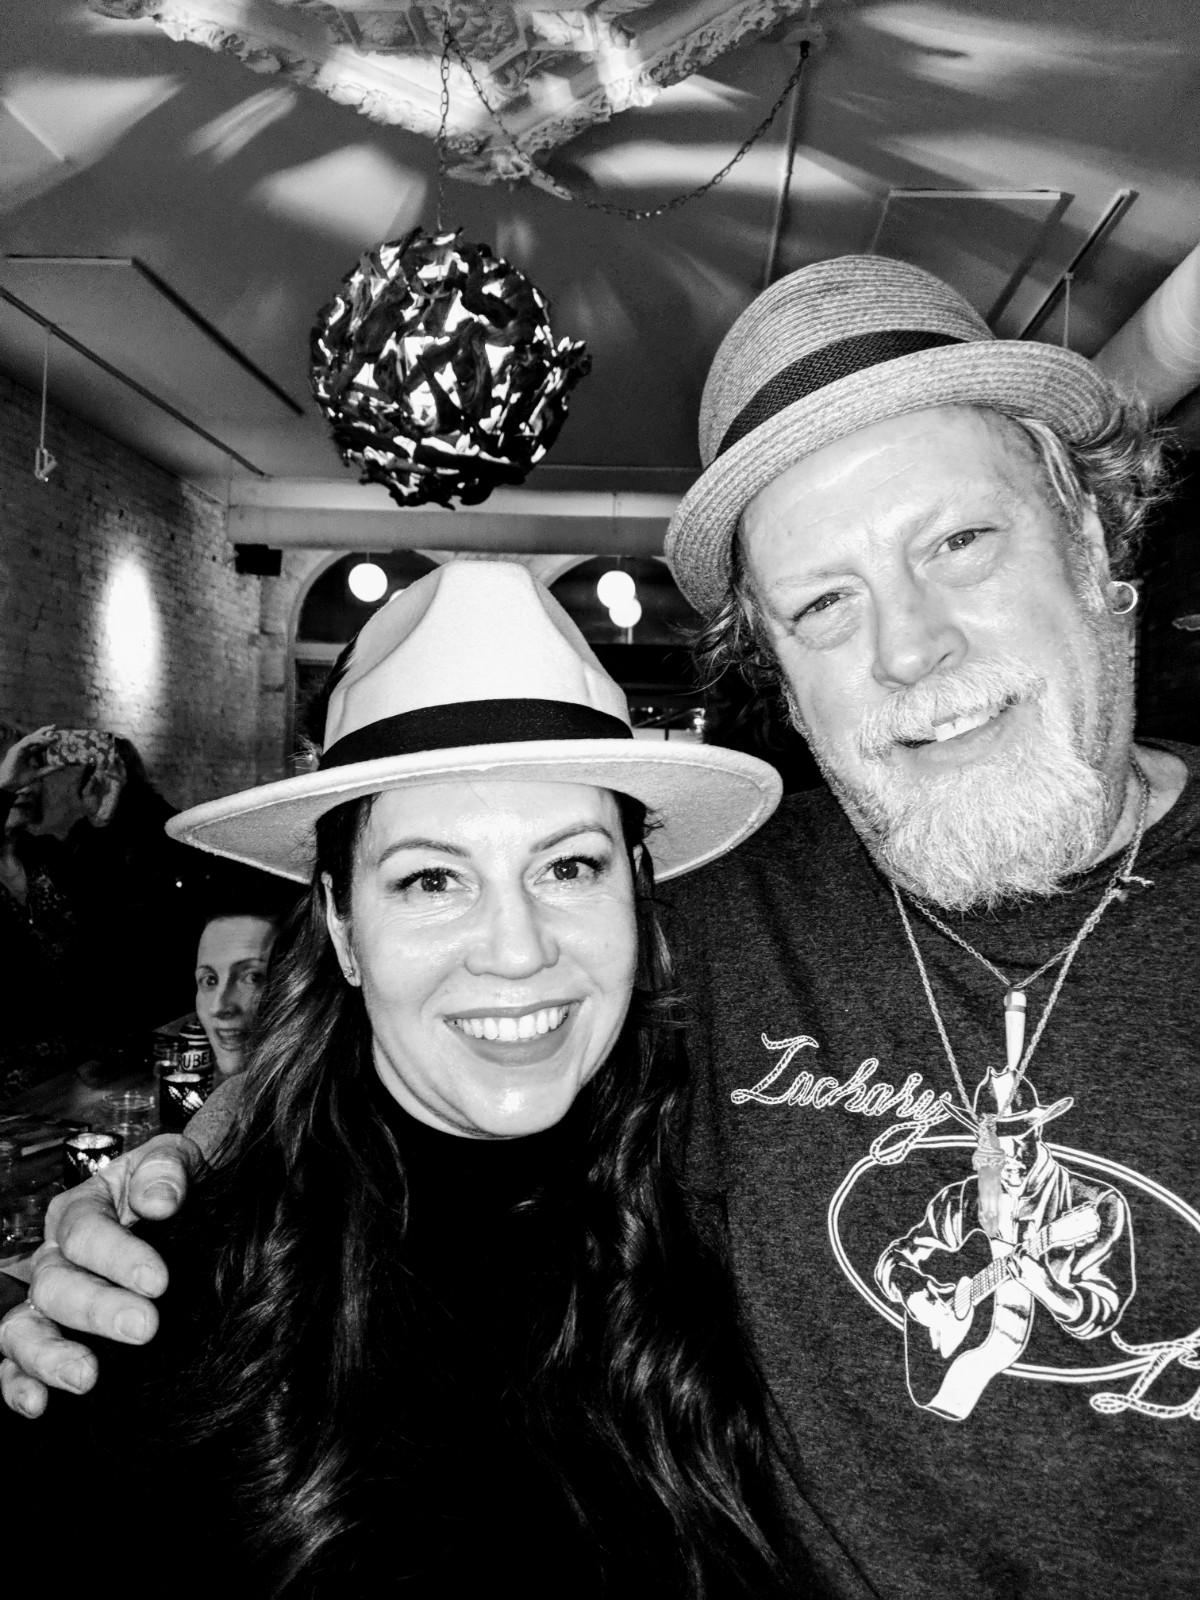 Lori D'Agostino with Crow. Bar's Steve Vipond